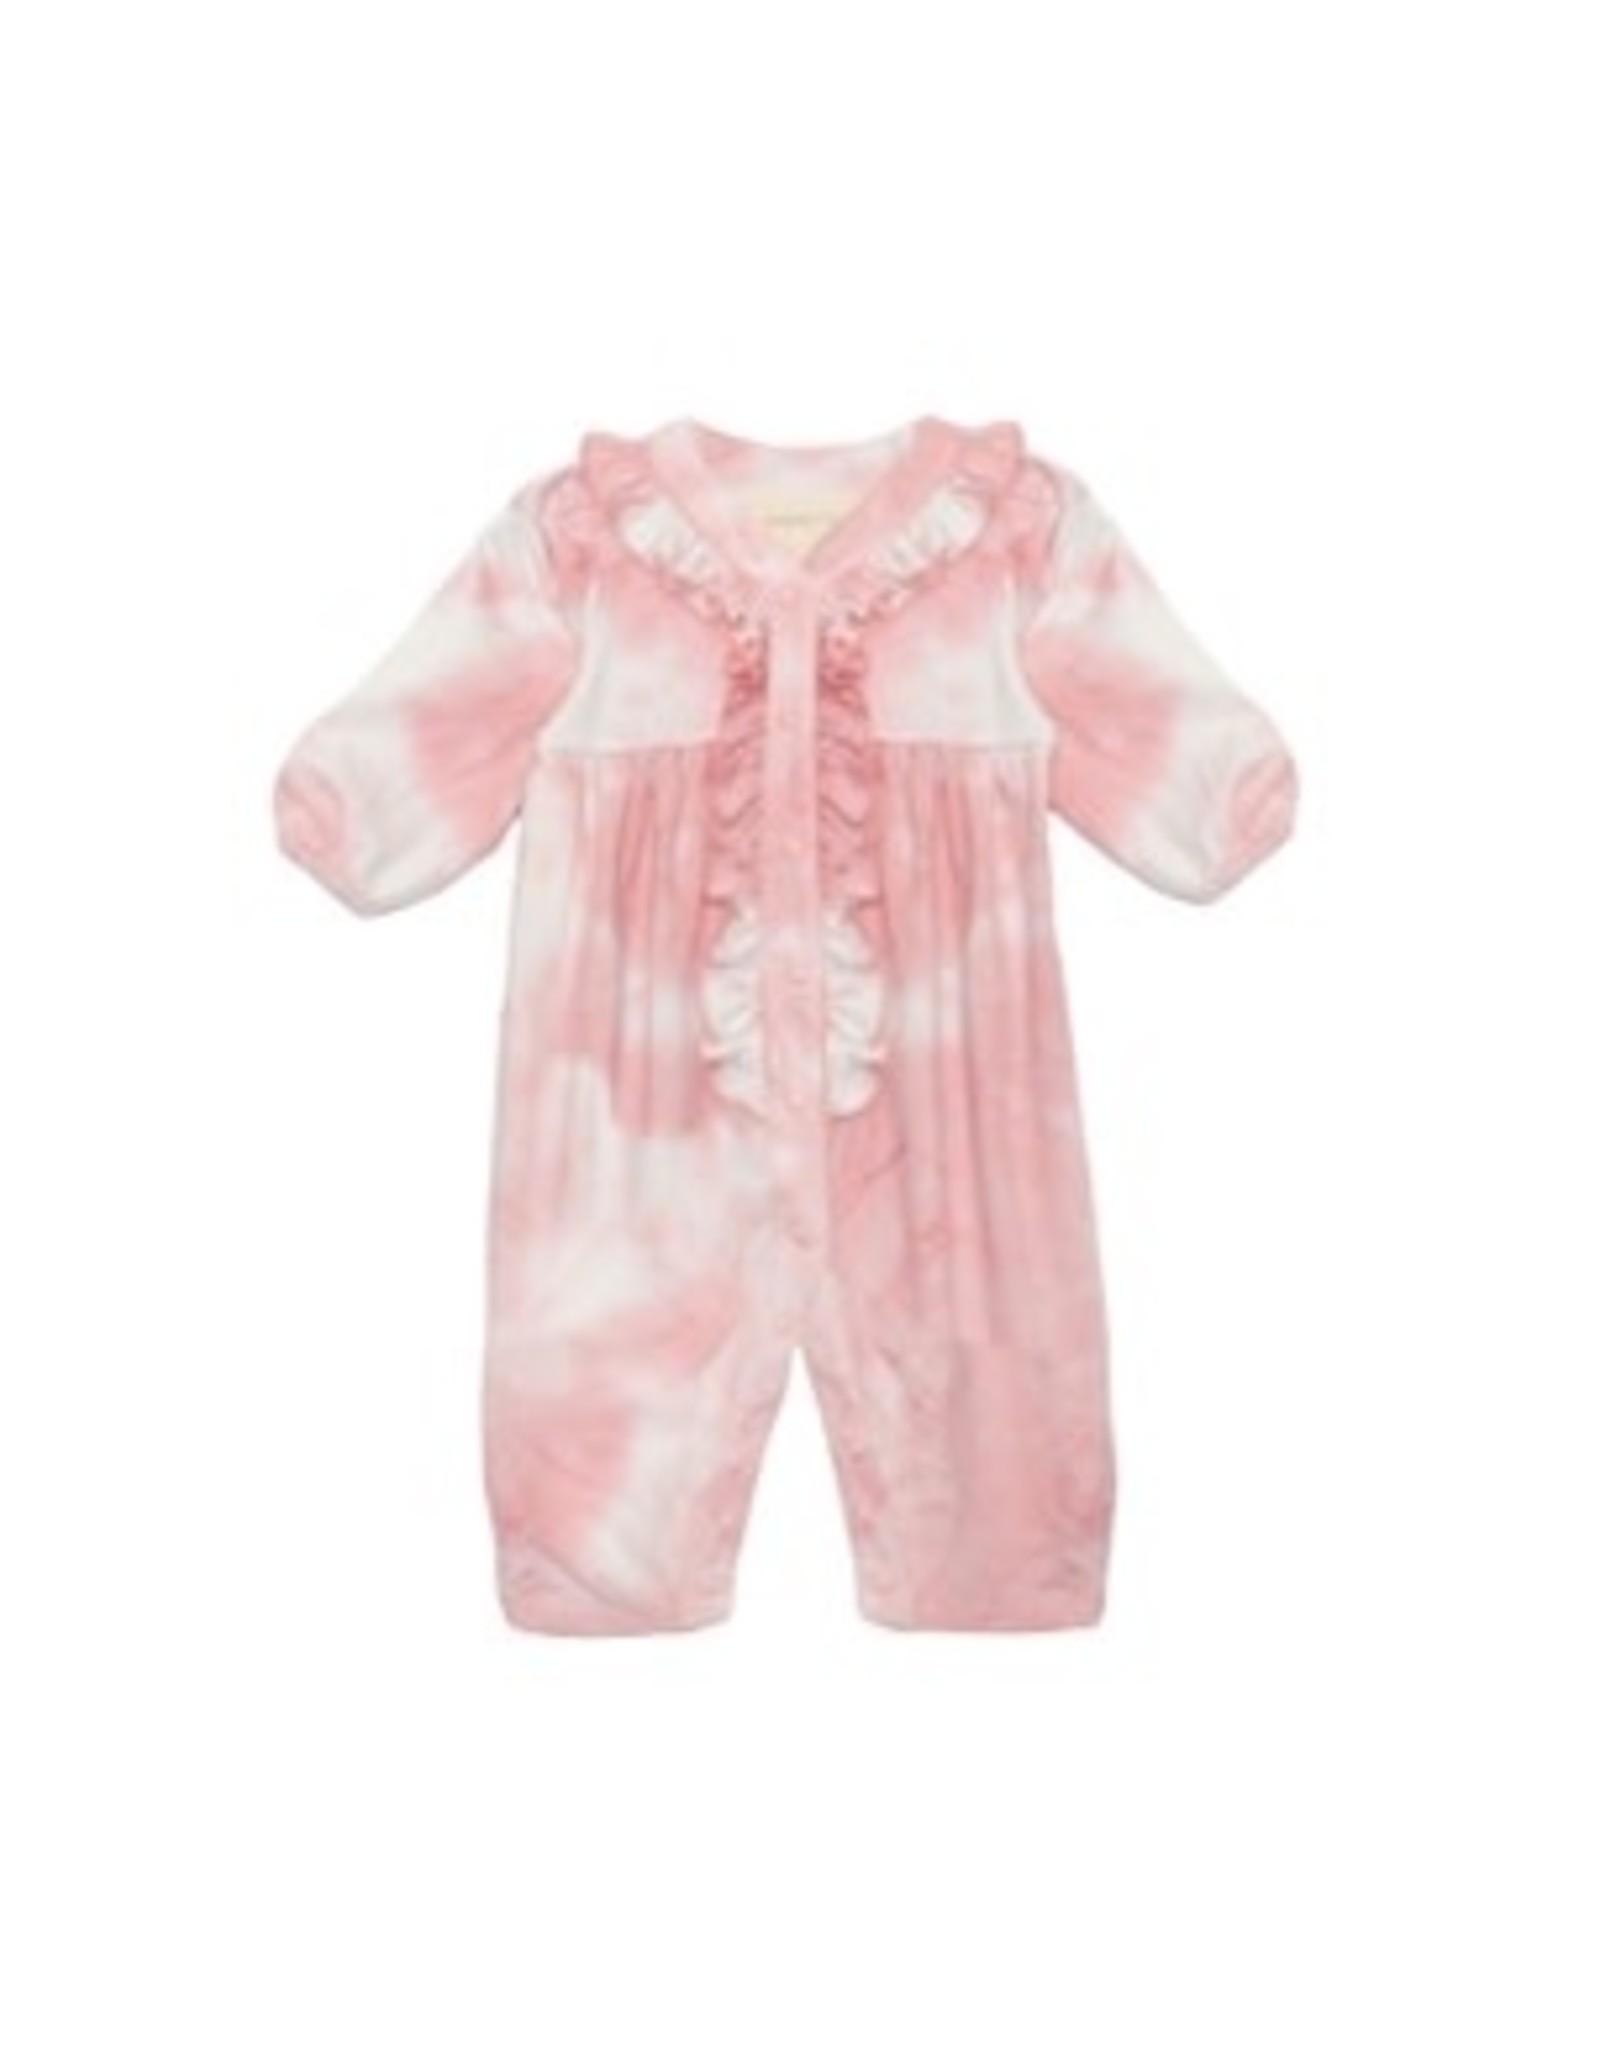 Mabel & Honey Mabel & Honey- Little Lovely Knit Romper: Pink